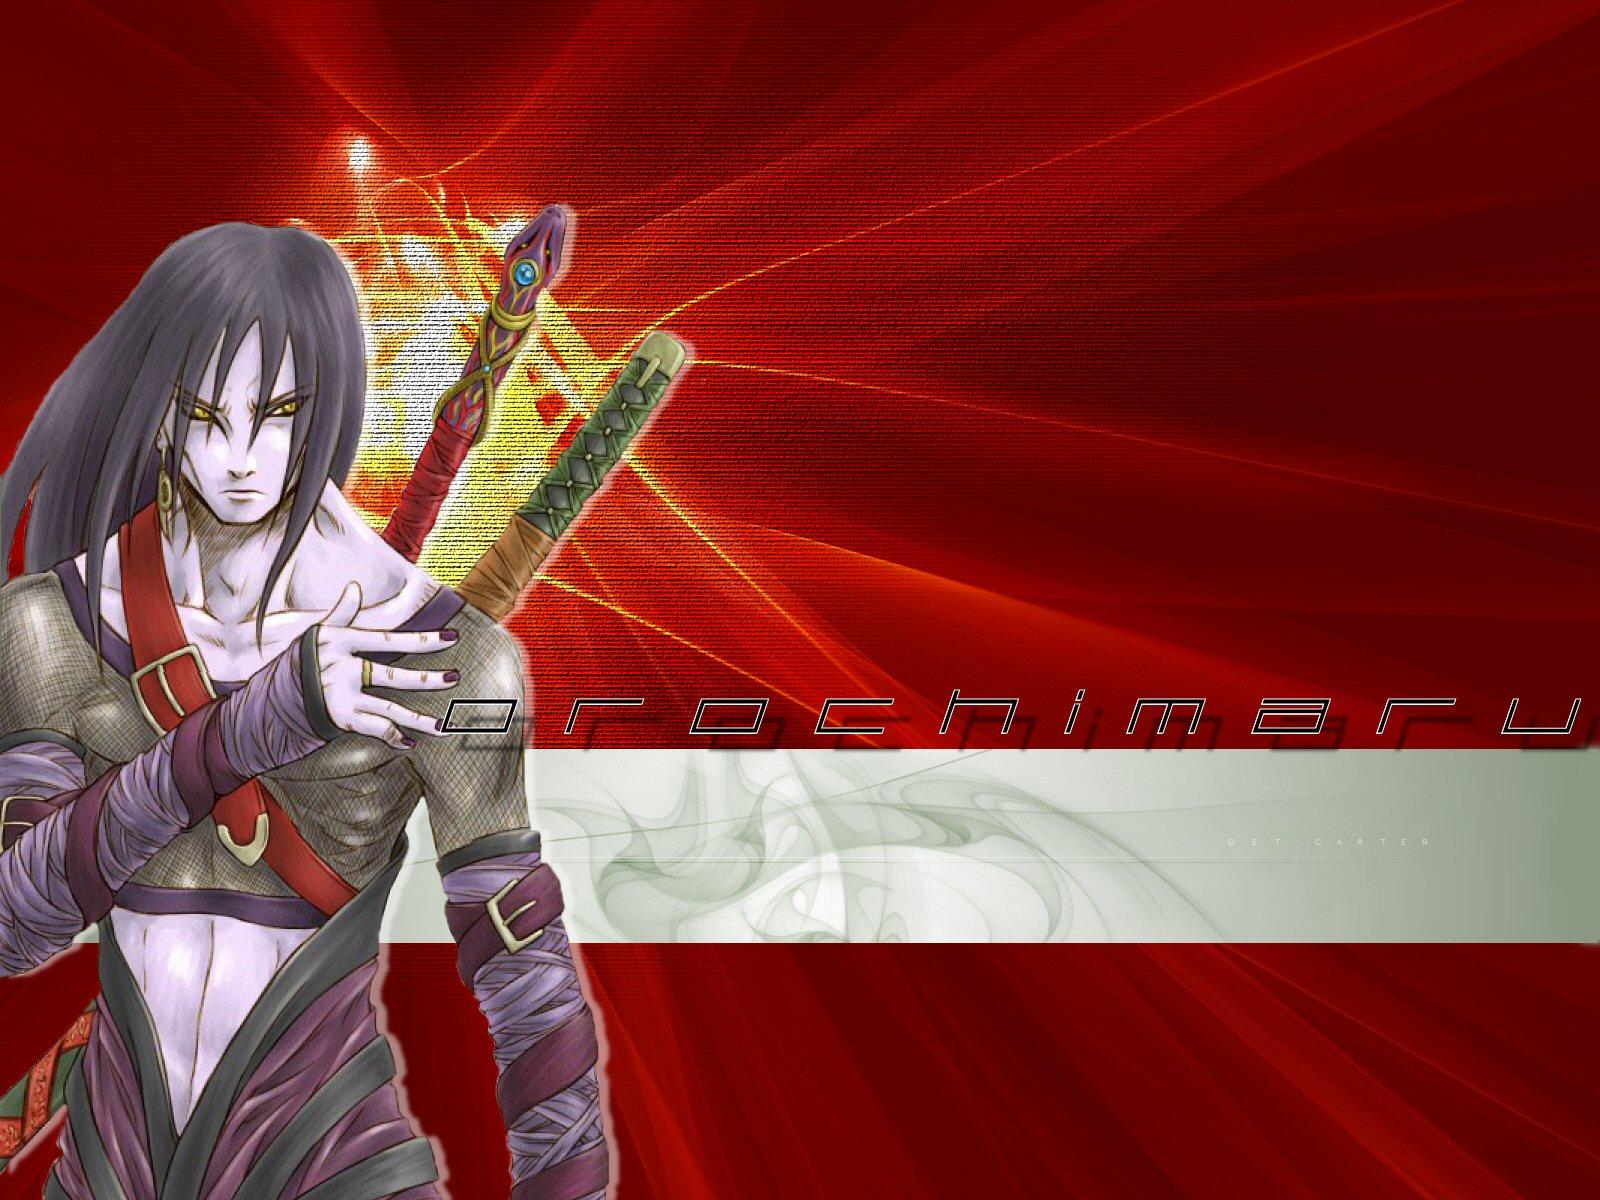 Orochimaru Wallpaper from Naruto Shippuden Free Download